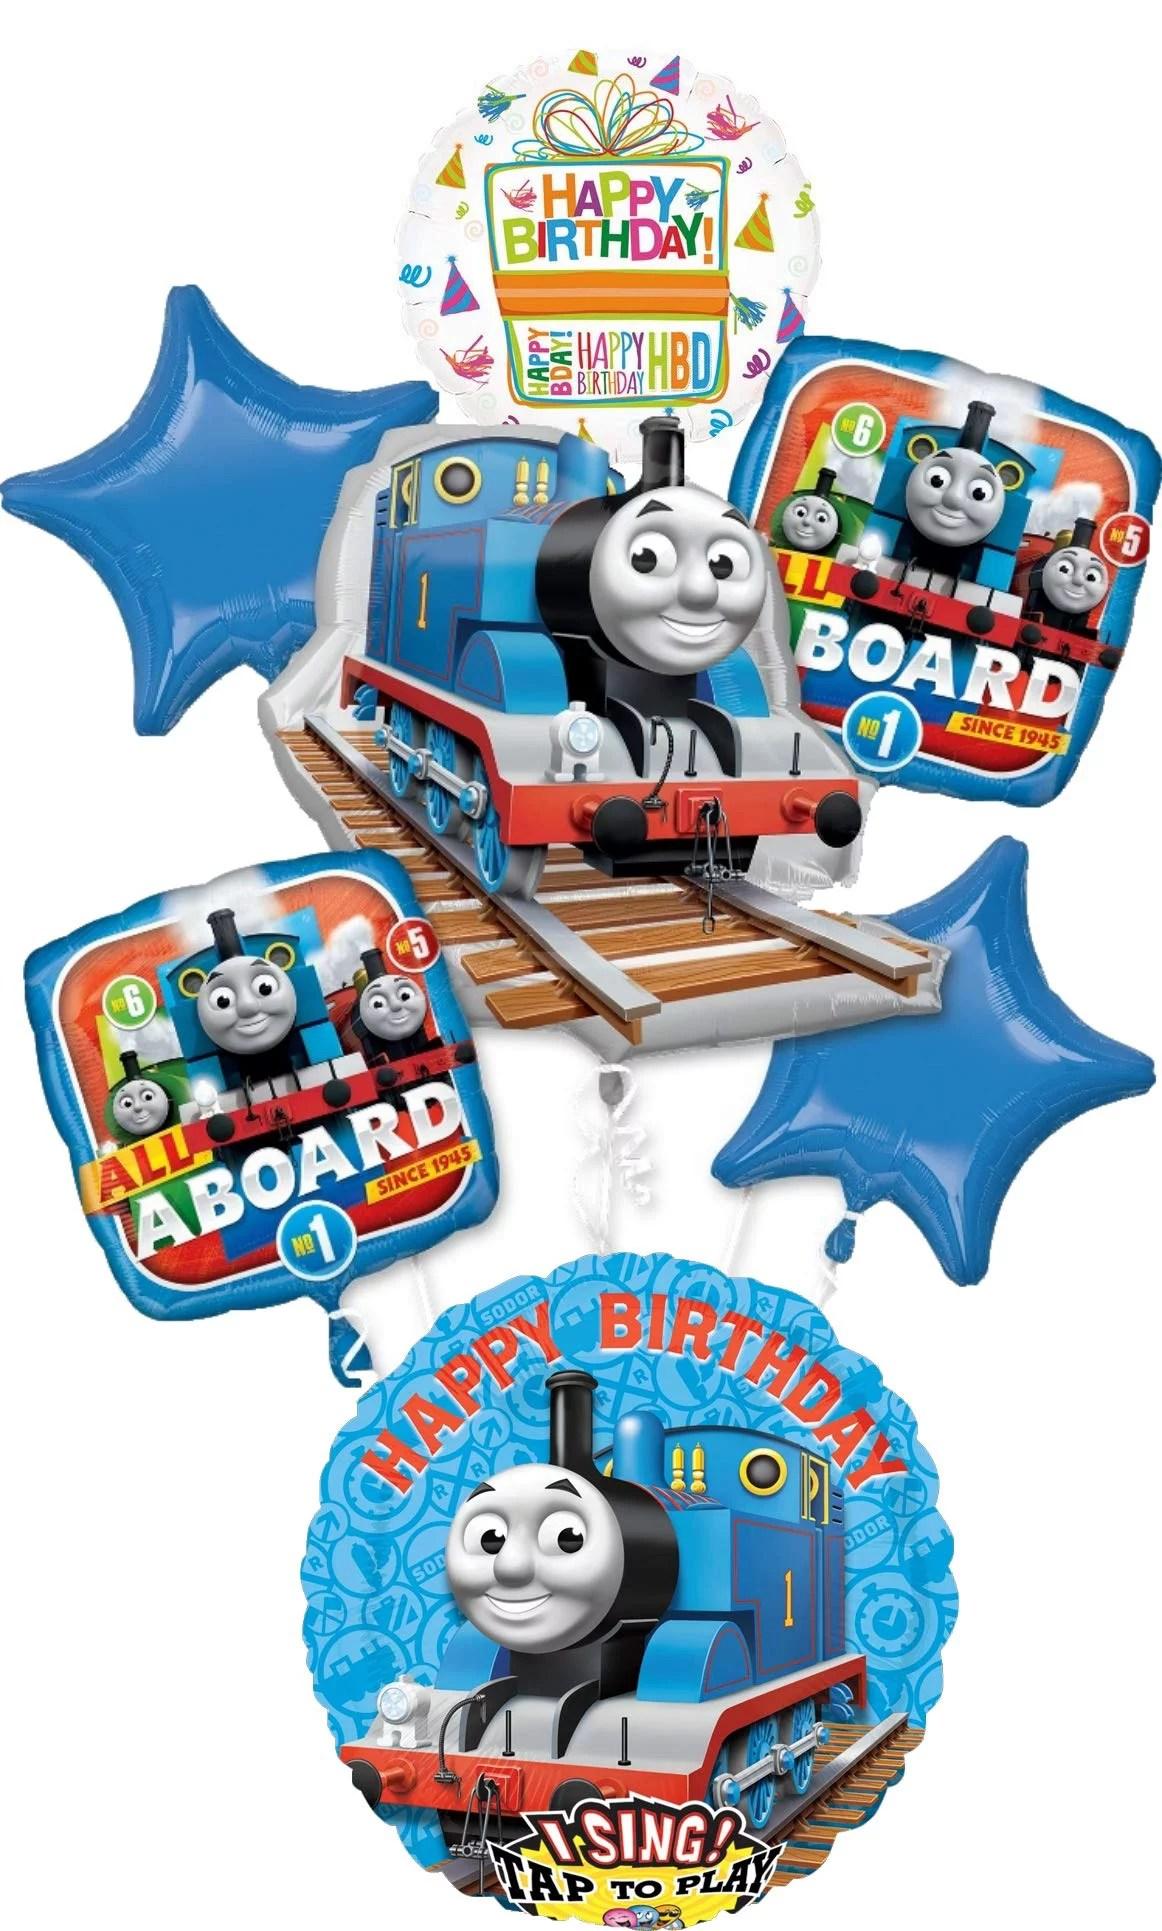 Thomas The Train Party Supplies Birthday Sing A Tune Tank Engine Balloon Bouquet Decorations Walmart Com Walmart Com